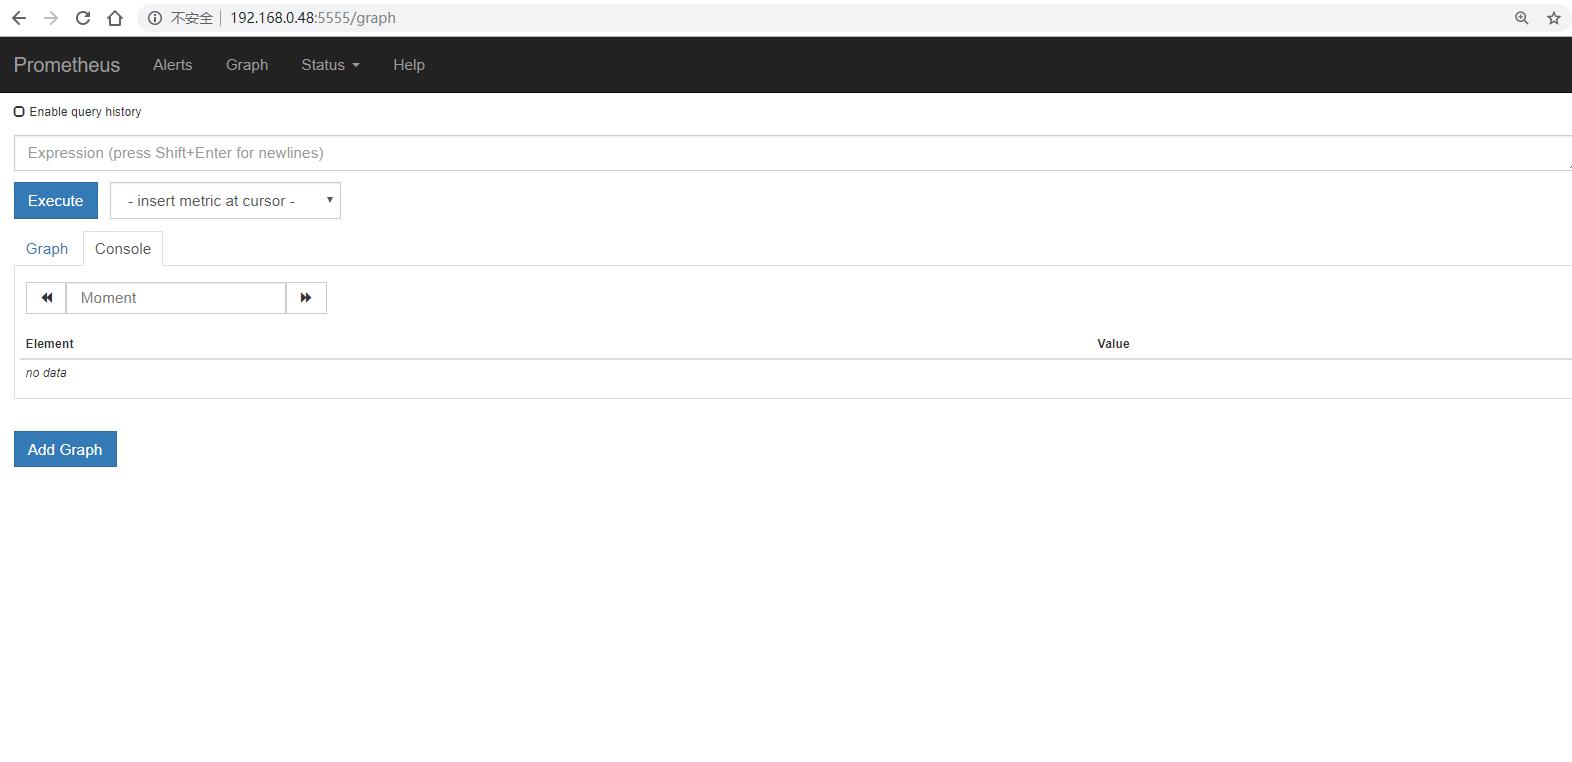 基于RocketMQ Prometheus Exporter 打造定制化DevOps平台